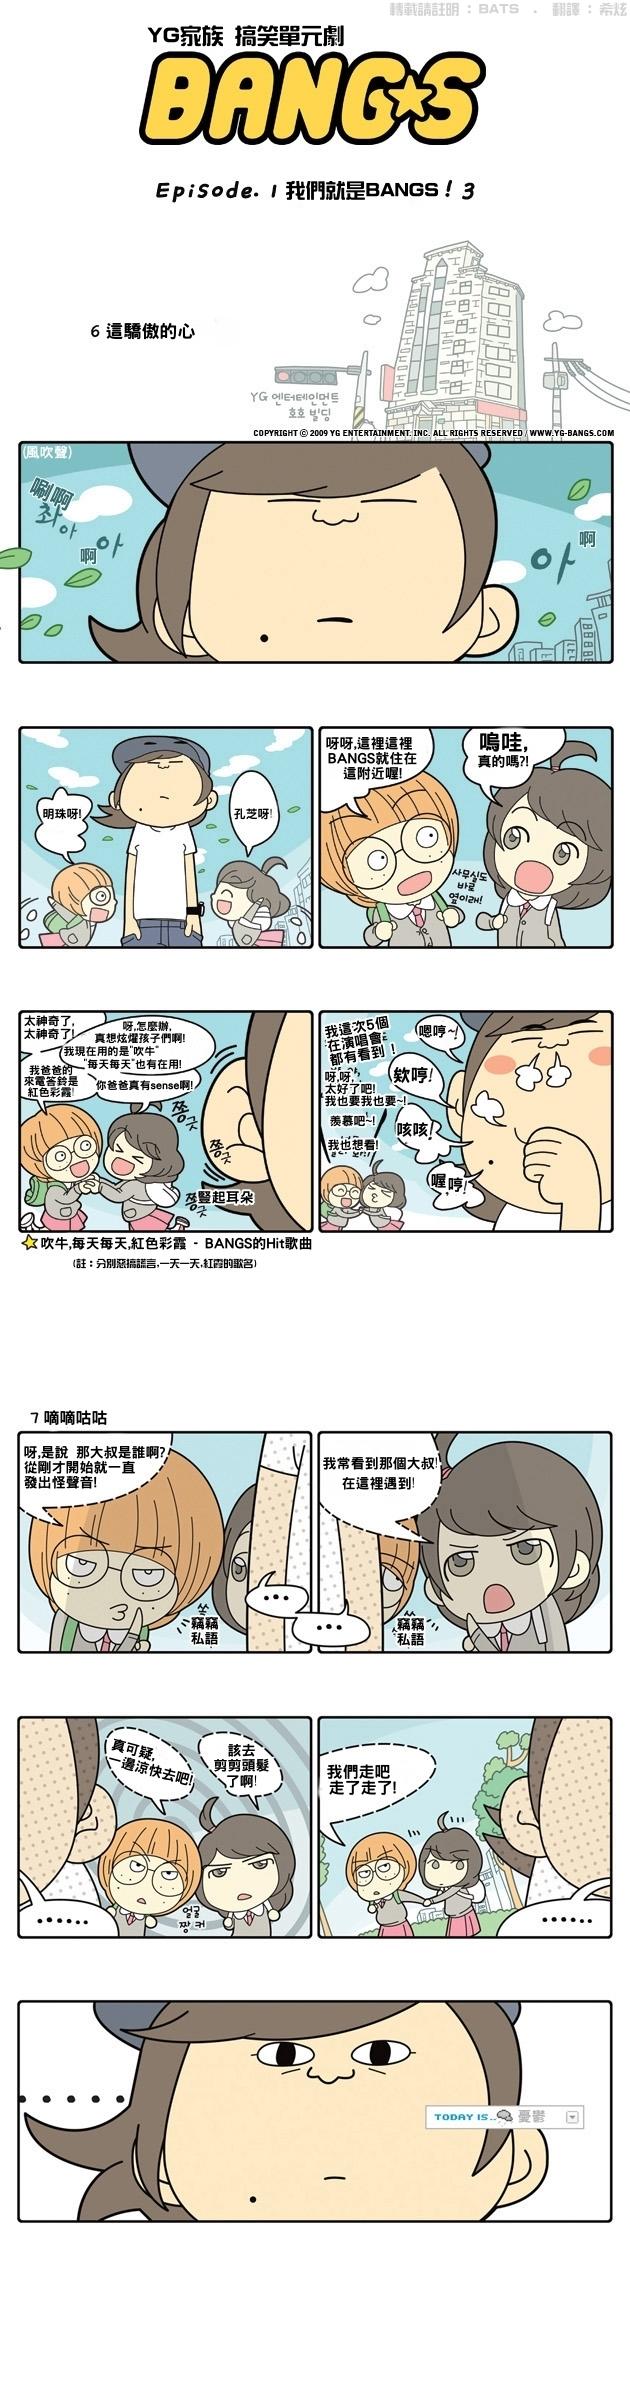 中譯 20090209_Bangs Comic 01.jpg